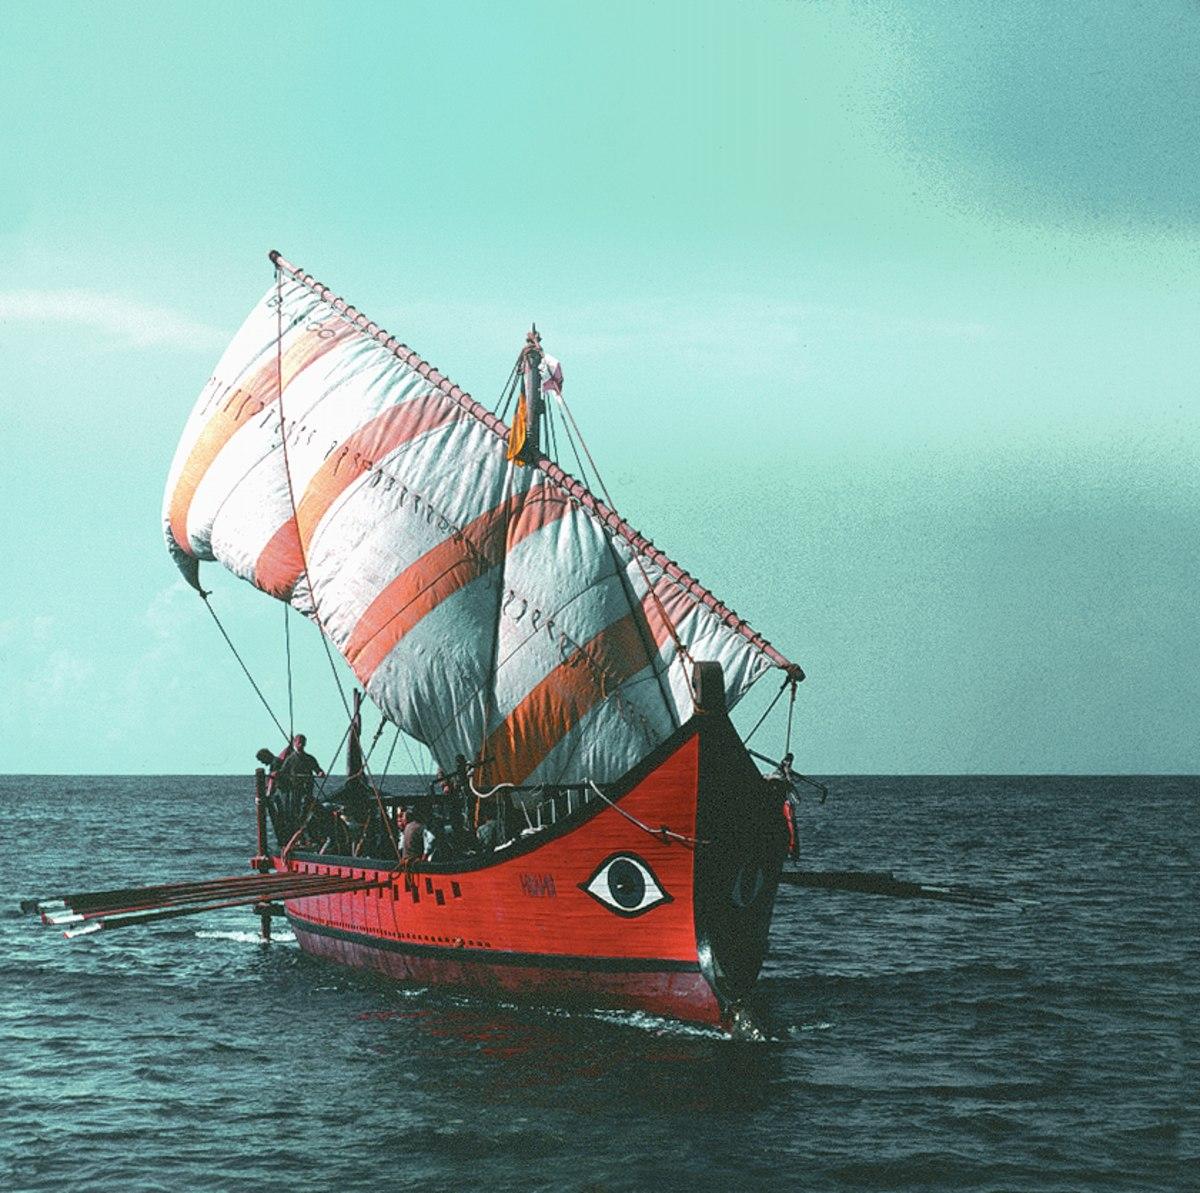 15aac41b5448 Ivlia (ship) - Wikipedia